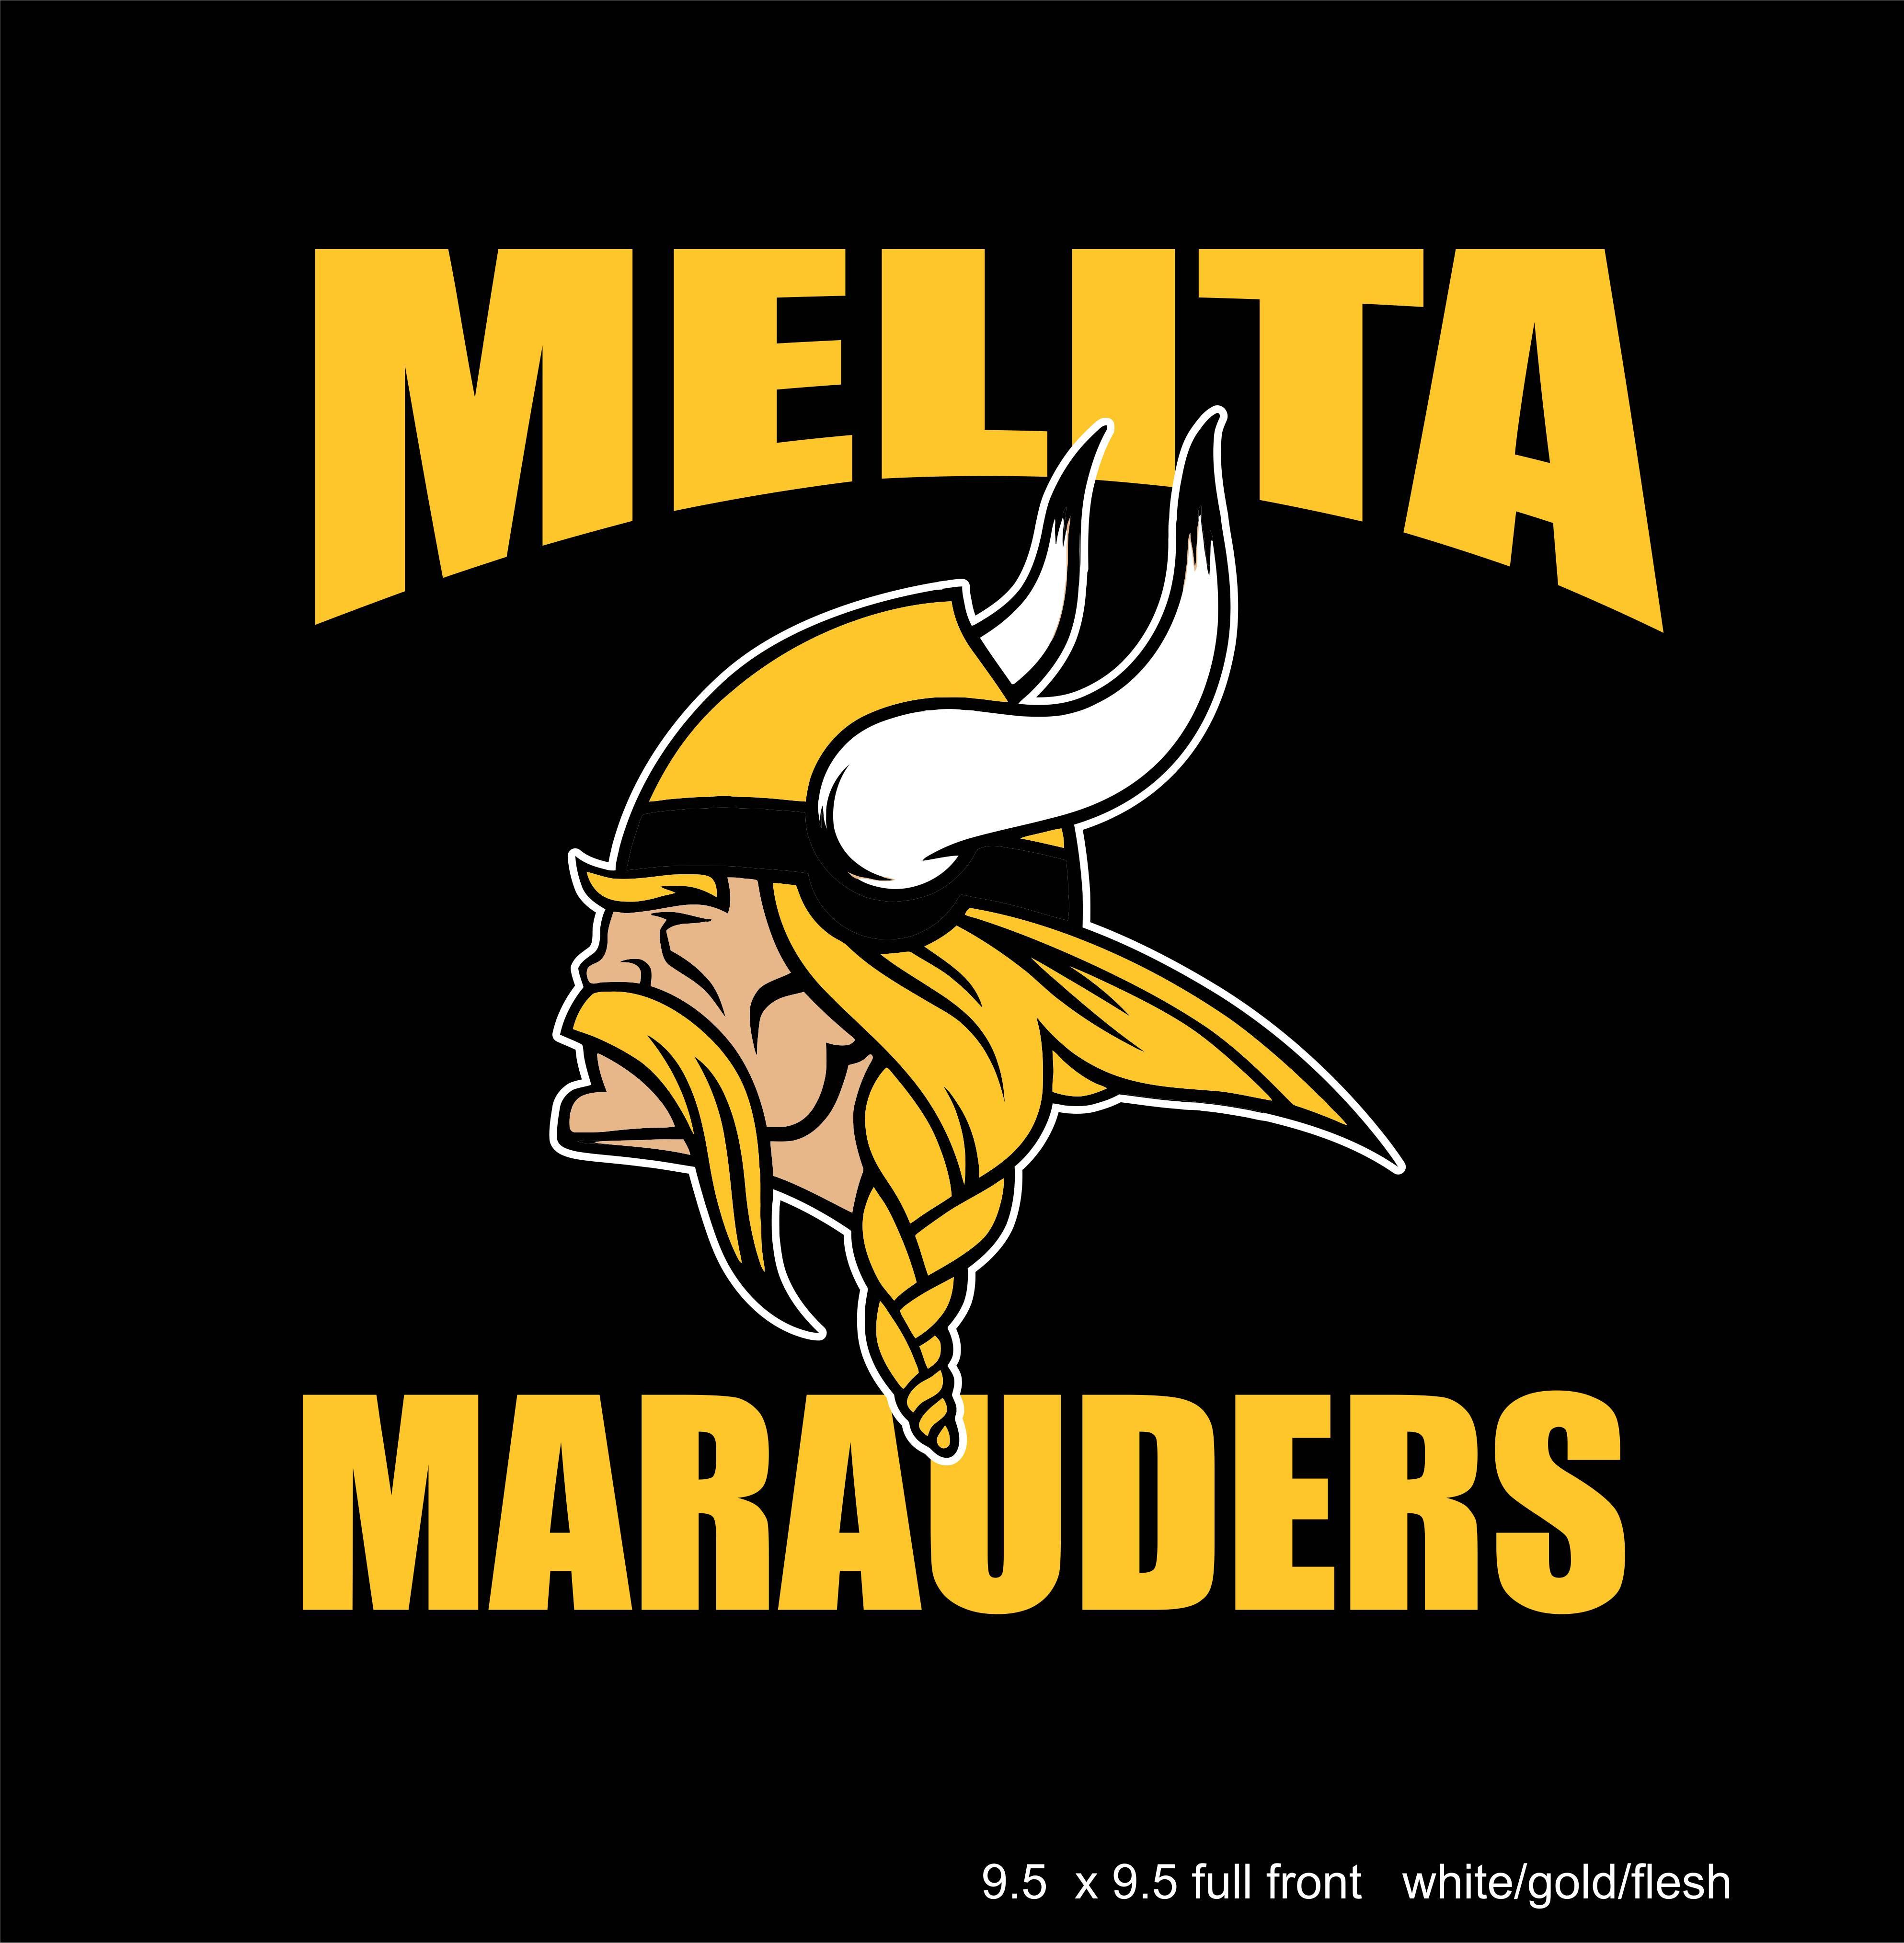 https://0901.nccdn.net/4_2/000/000/03f/ac7/Melita-Marauders-full-front-logo-3974x4056.jpg